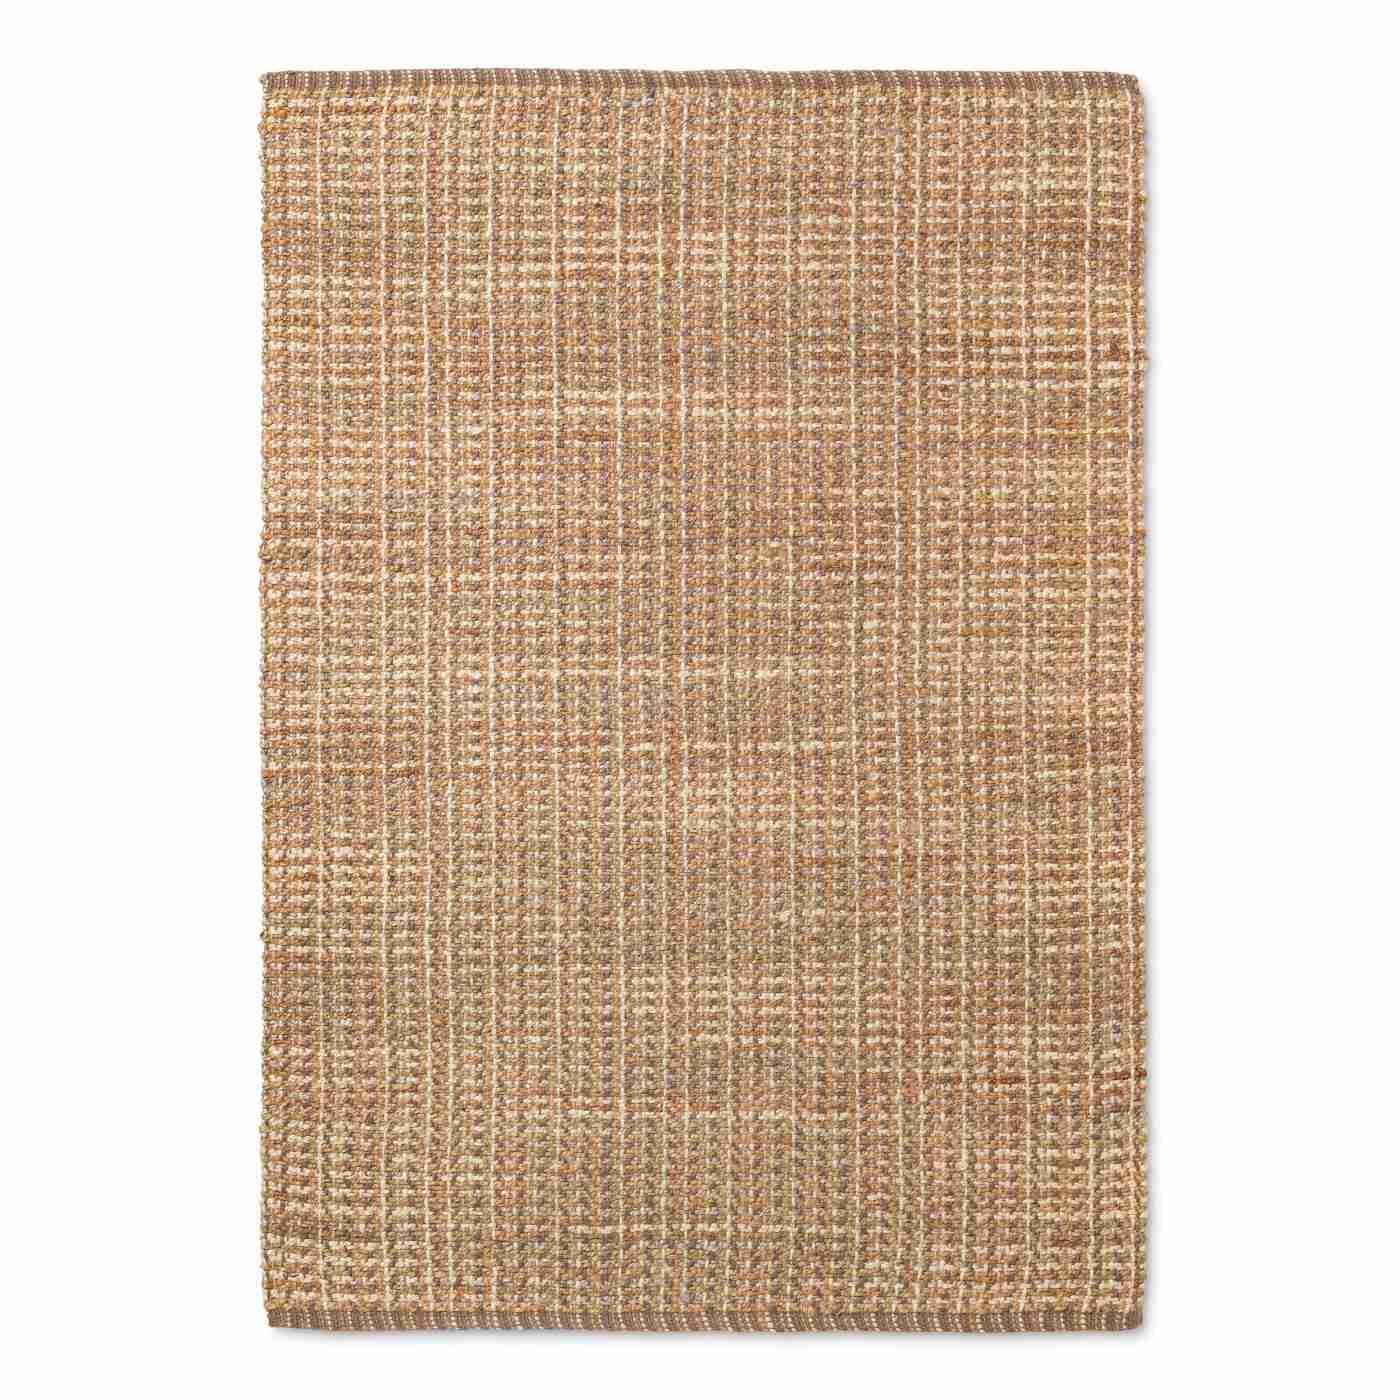 Kingston Natural Woven Rug